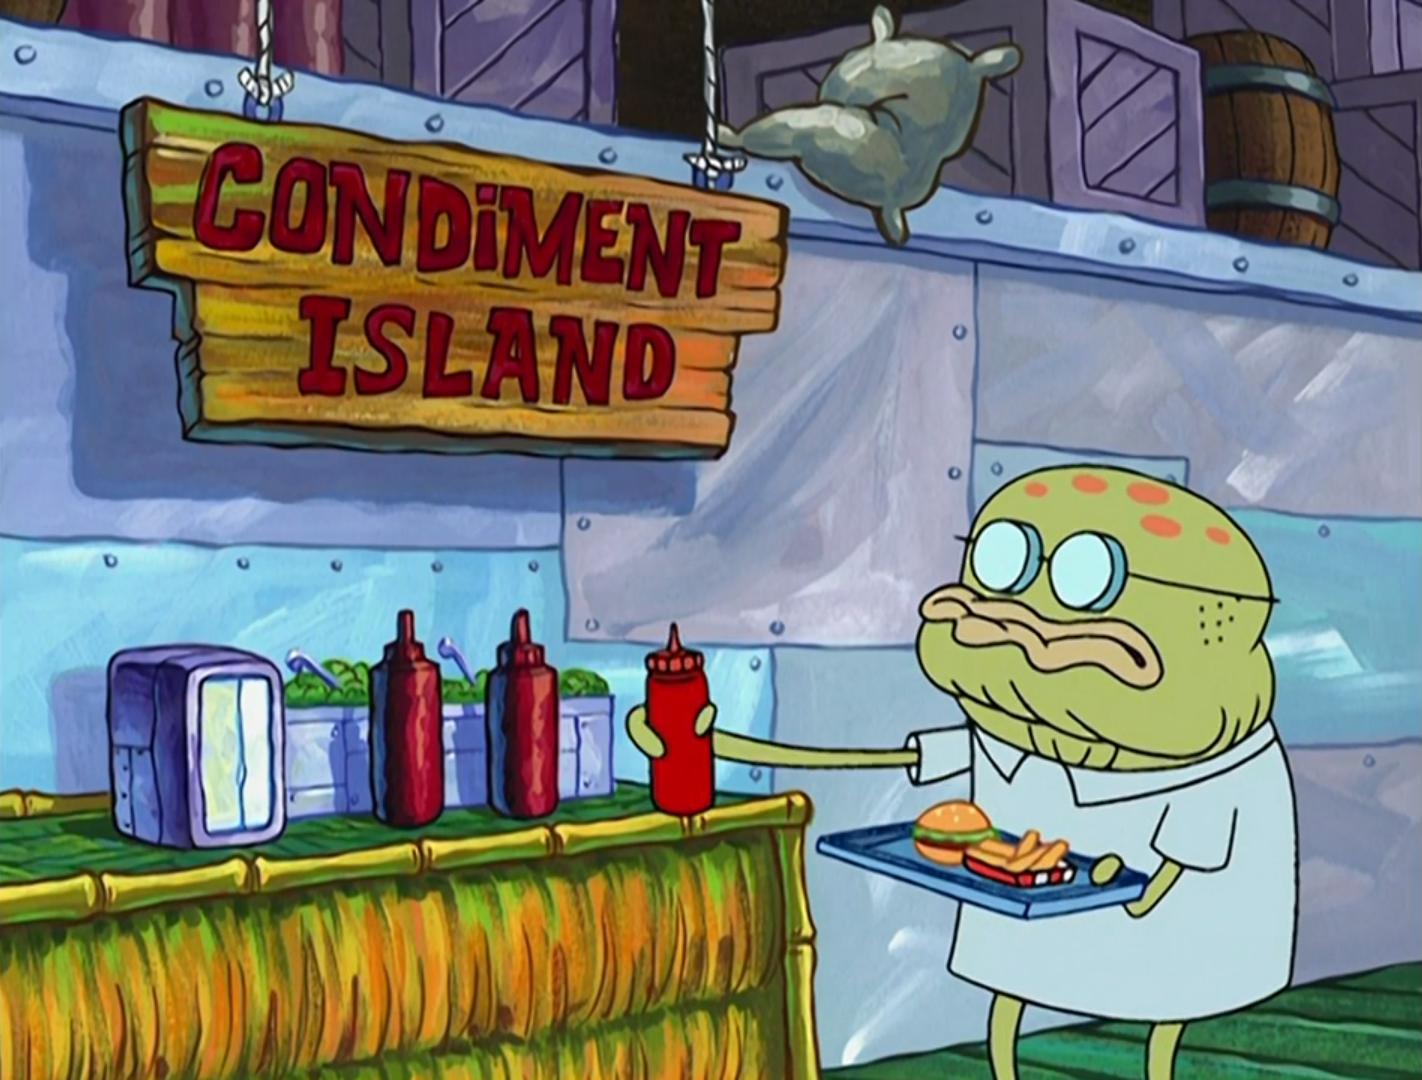 Condiment Island